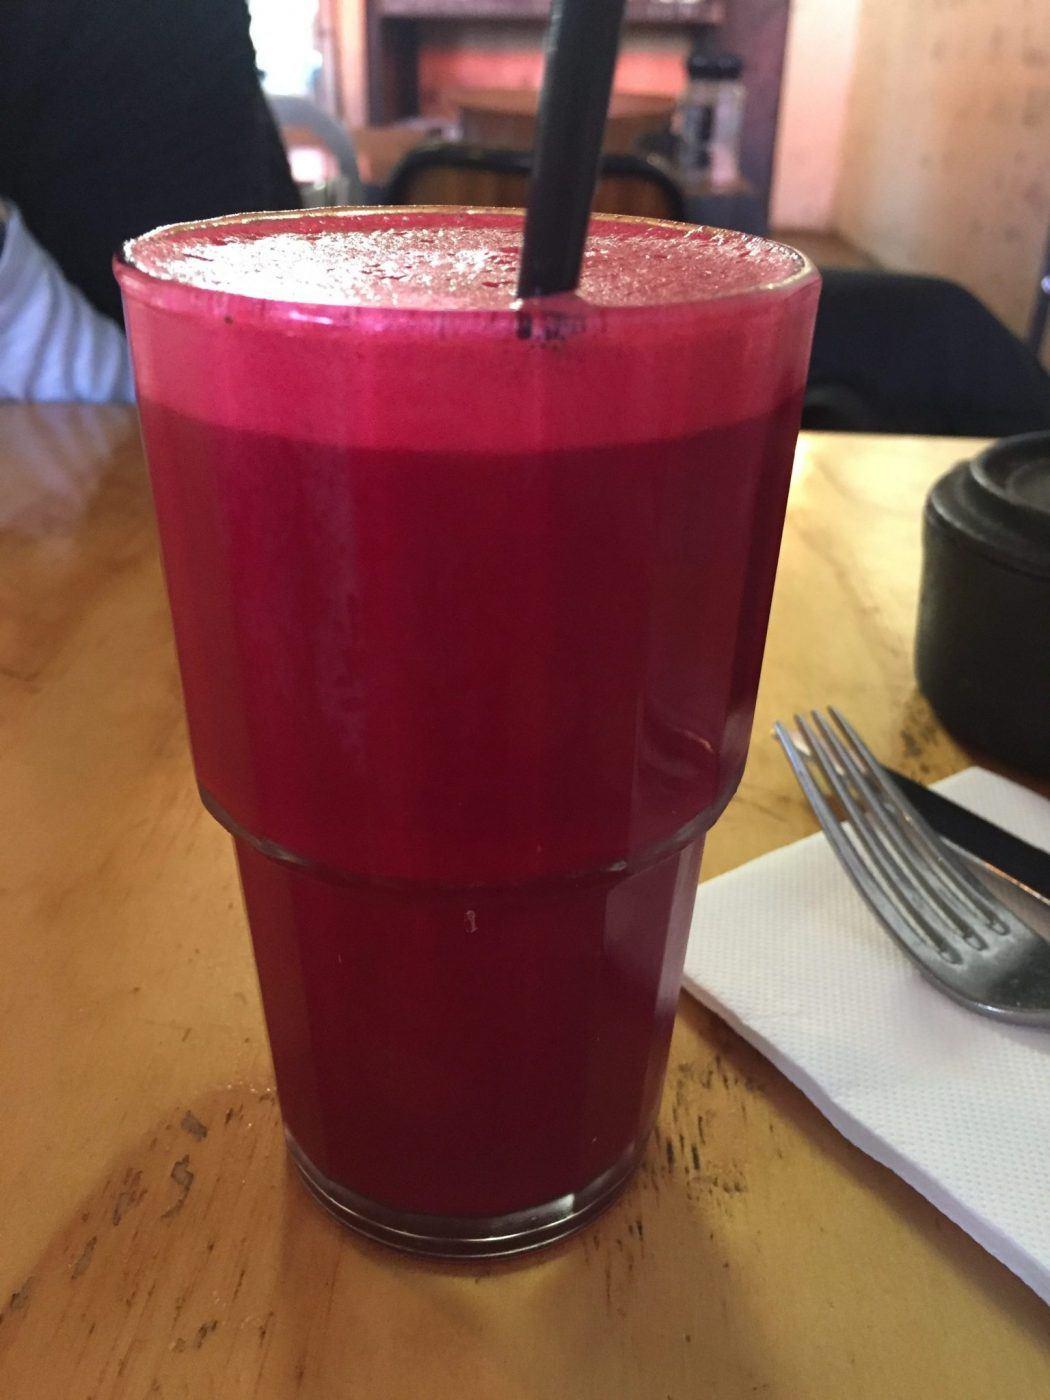 red juice at Dee's in Dromana on the Mornington Peninsula